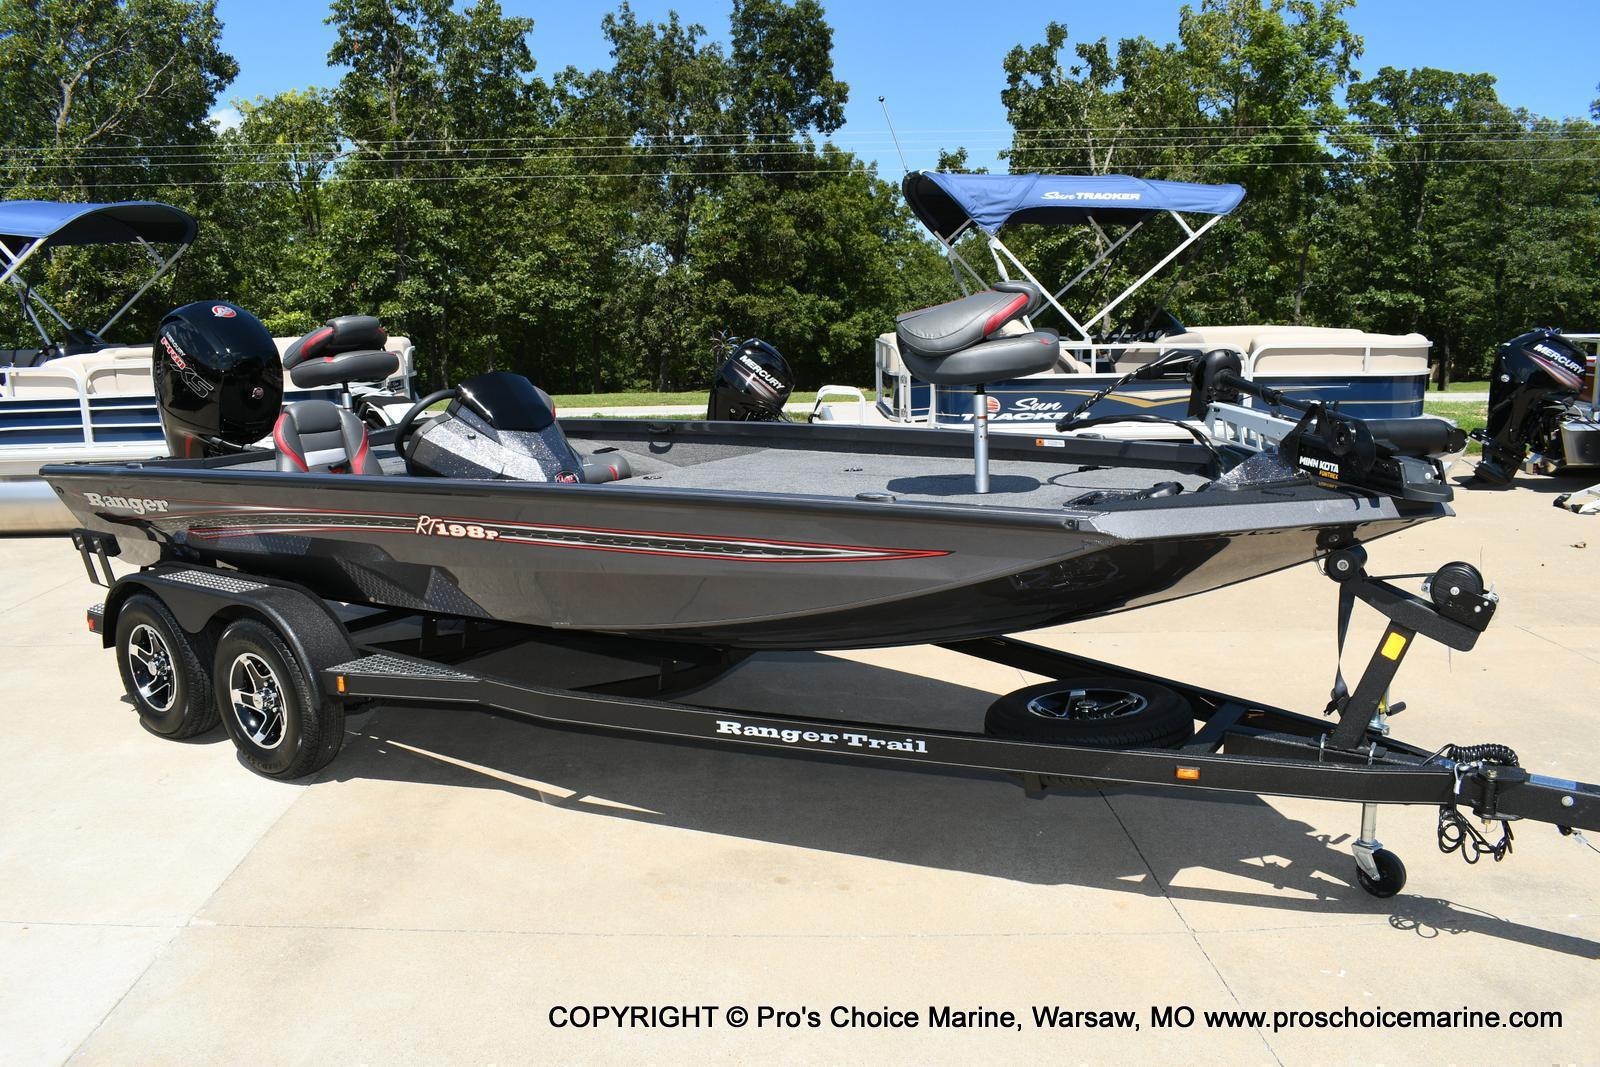 Boats from Ranger Pro's Choice Marine Warsaw, MO (877) 827-2840